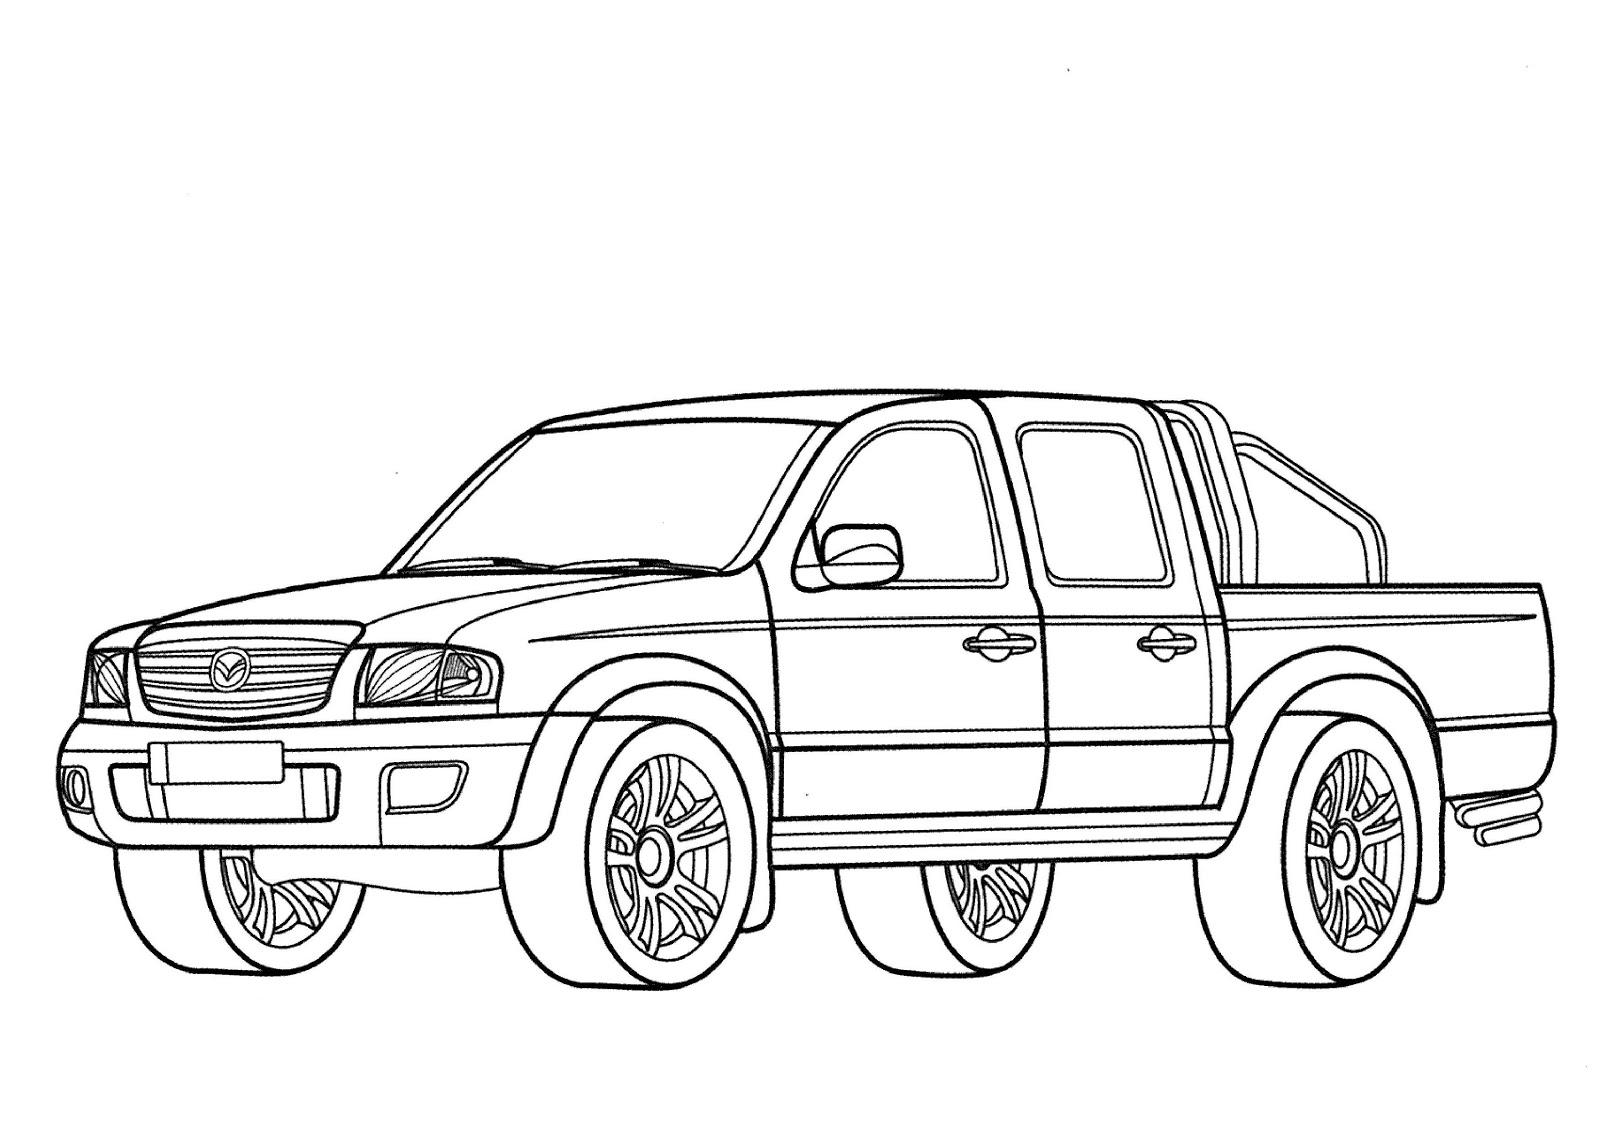 Dibujos Para Colorear De Carros Nissan ~ Ideas Creativas Sobre Colorear